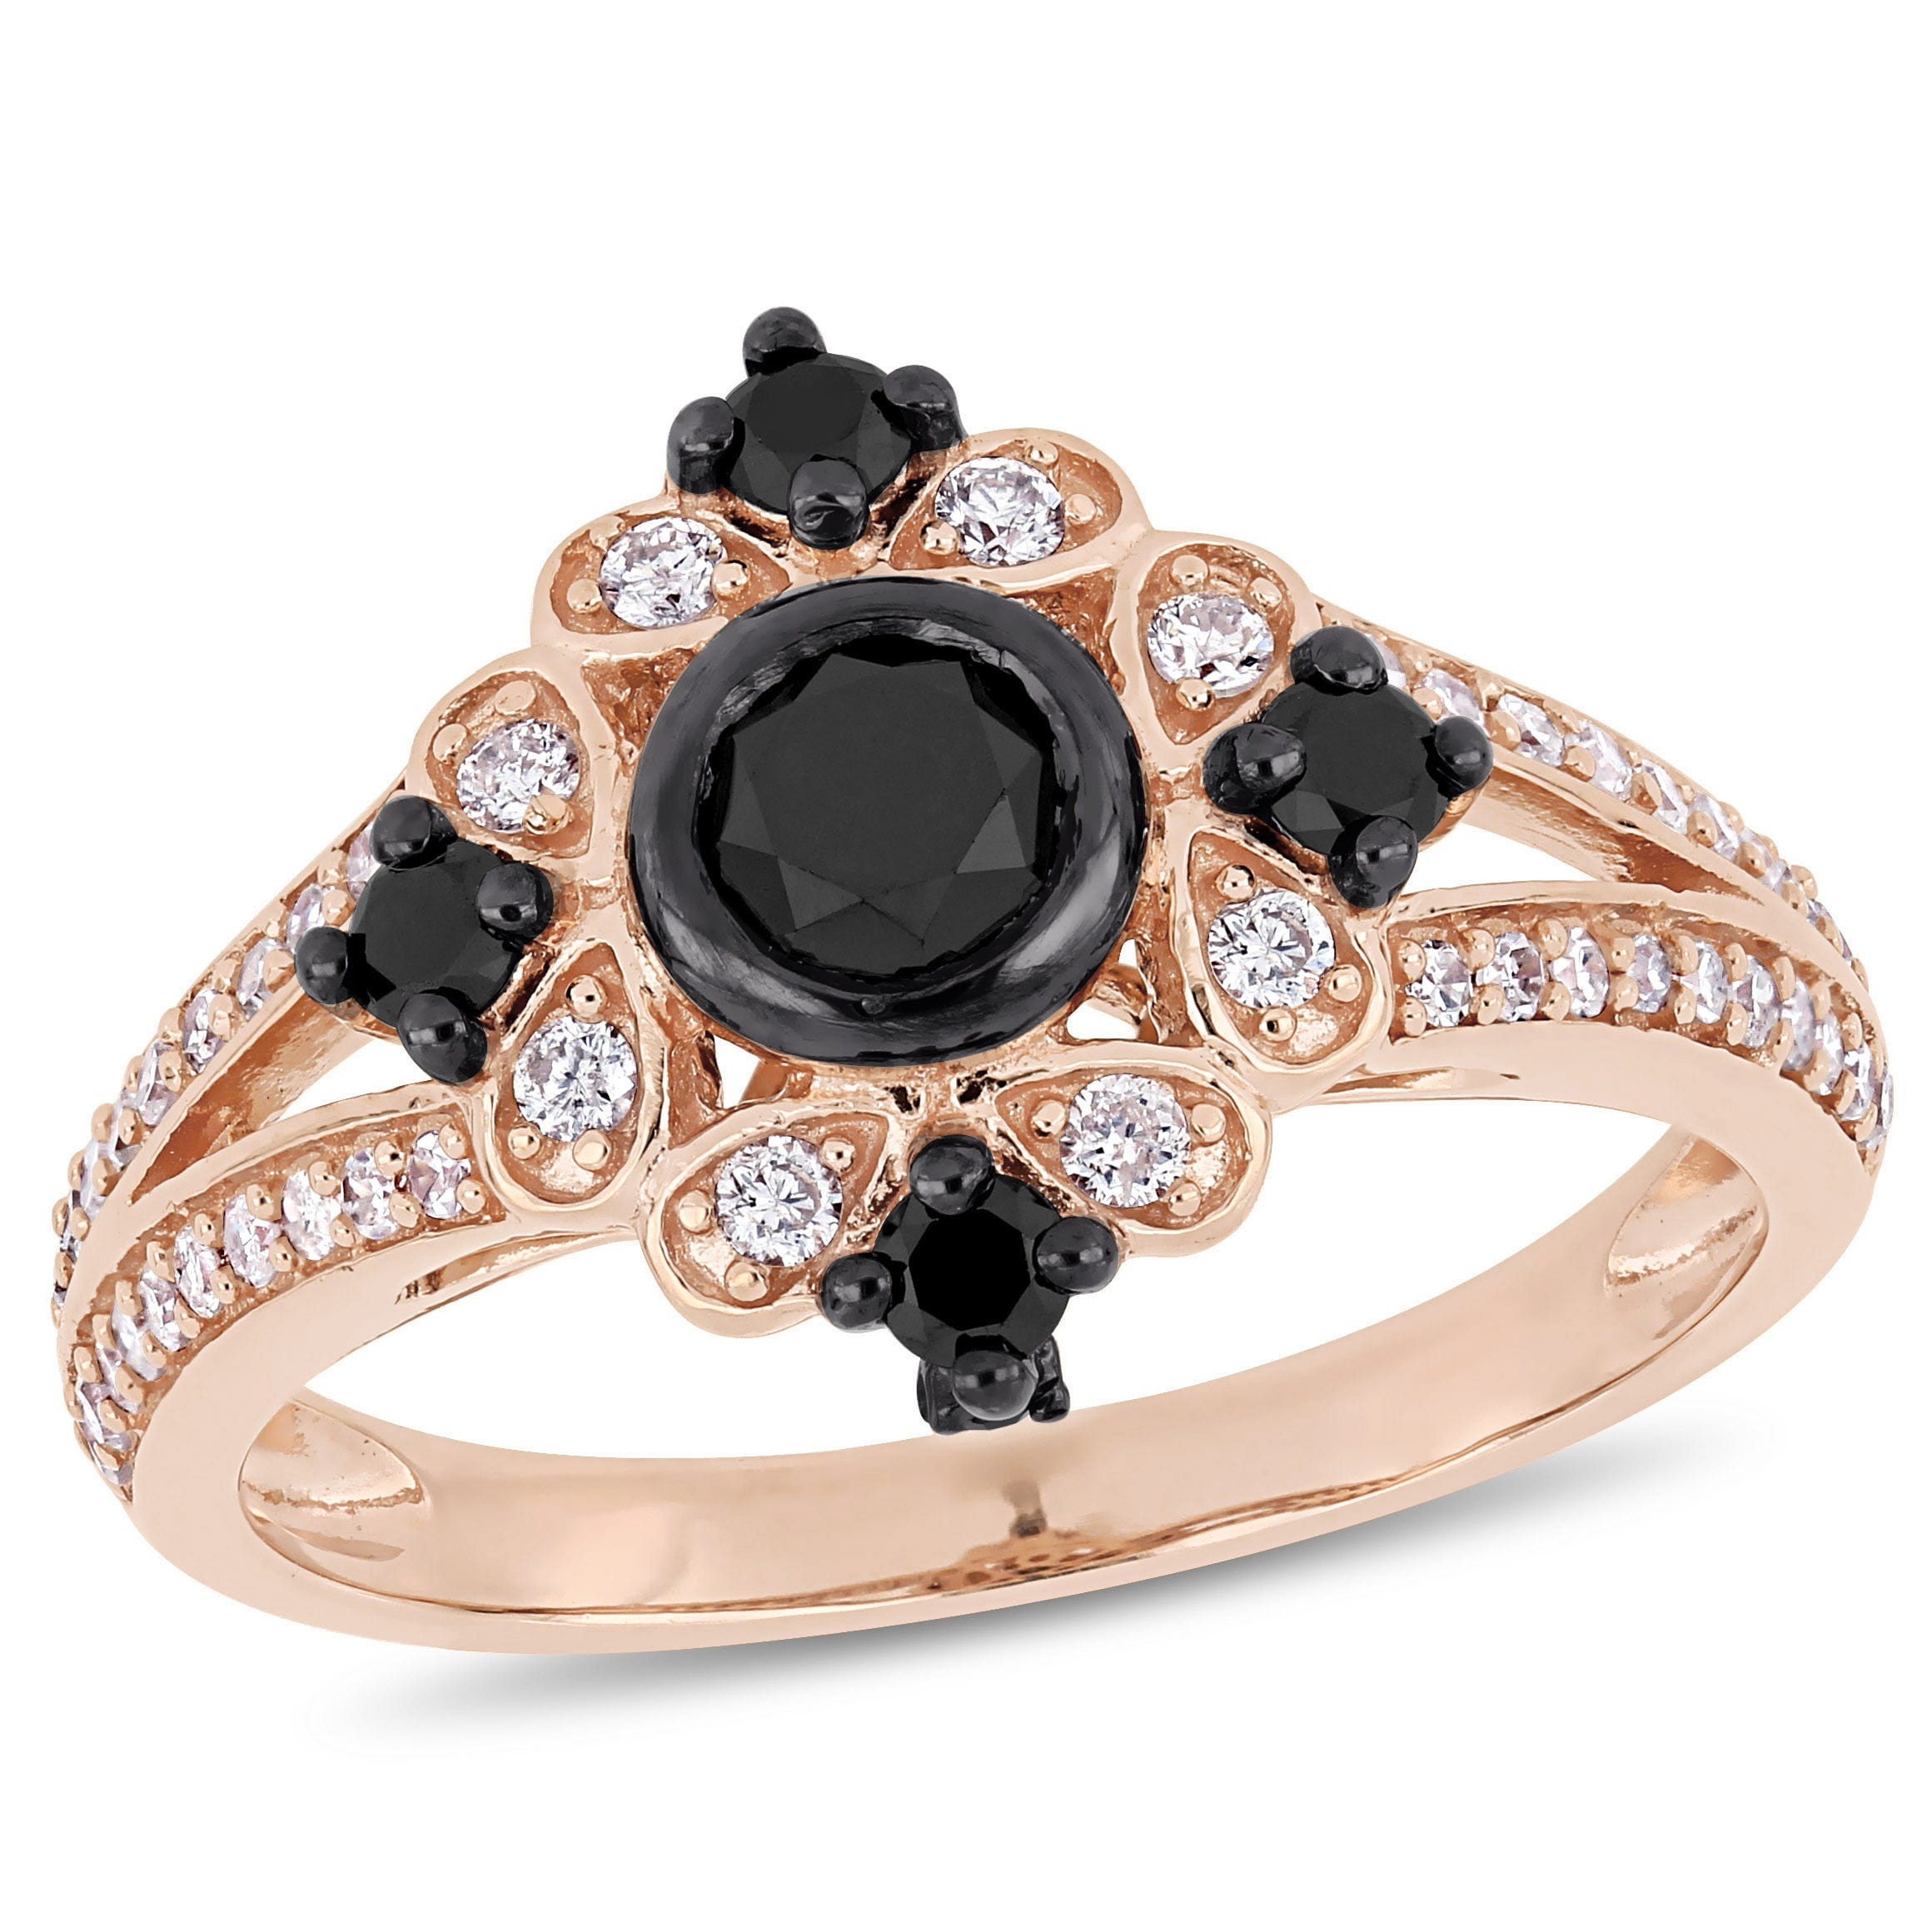 Black Diamond Vintage-Inspired 1ctw. Engagement Ring in Rose Gold